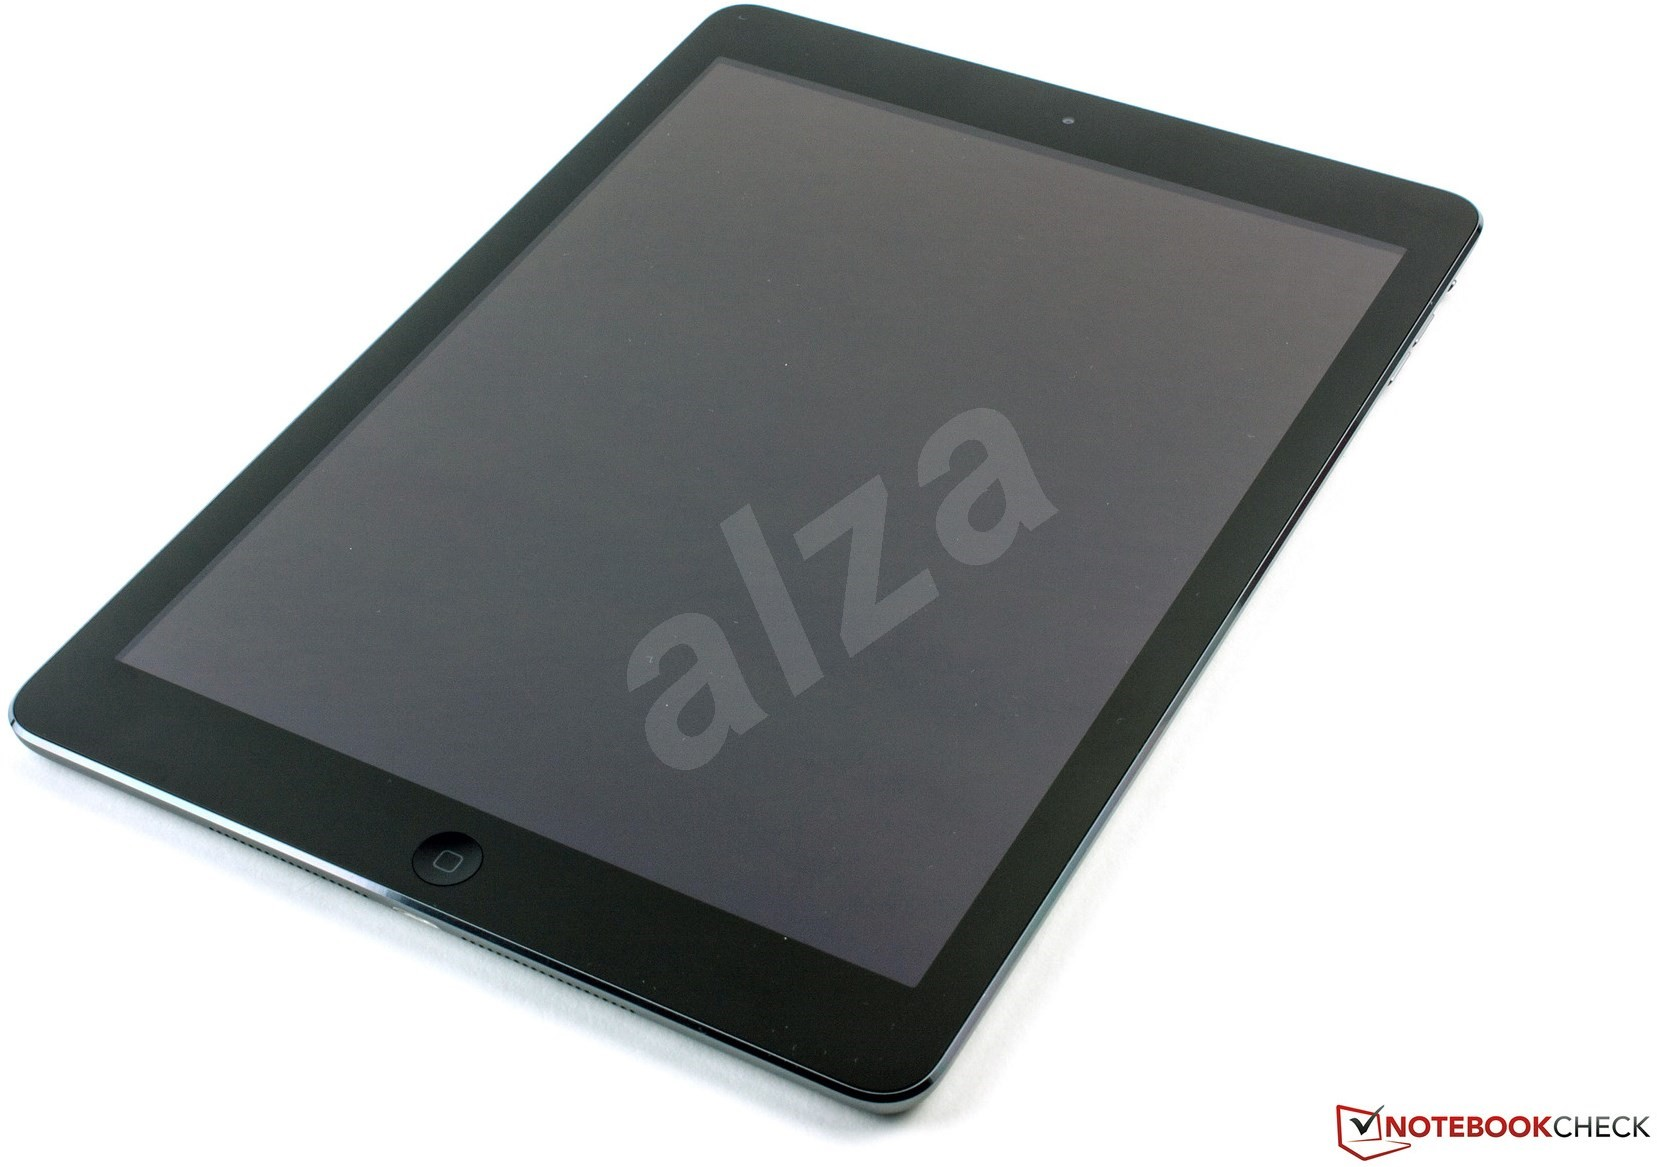 ipad mini 2 mit retina display 16gb wifi cellular. Black Bedroom Furniture Sets. Home Design Ideas